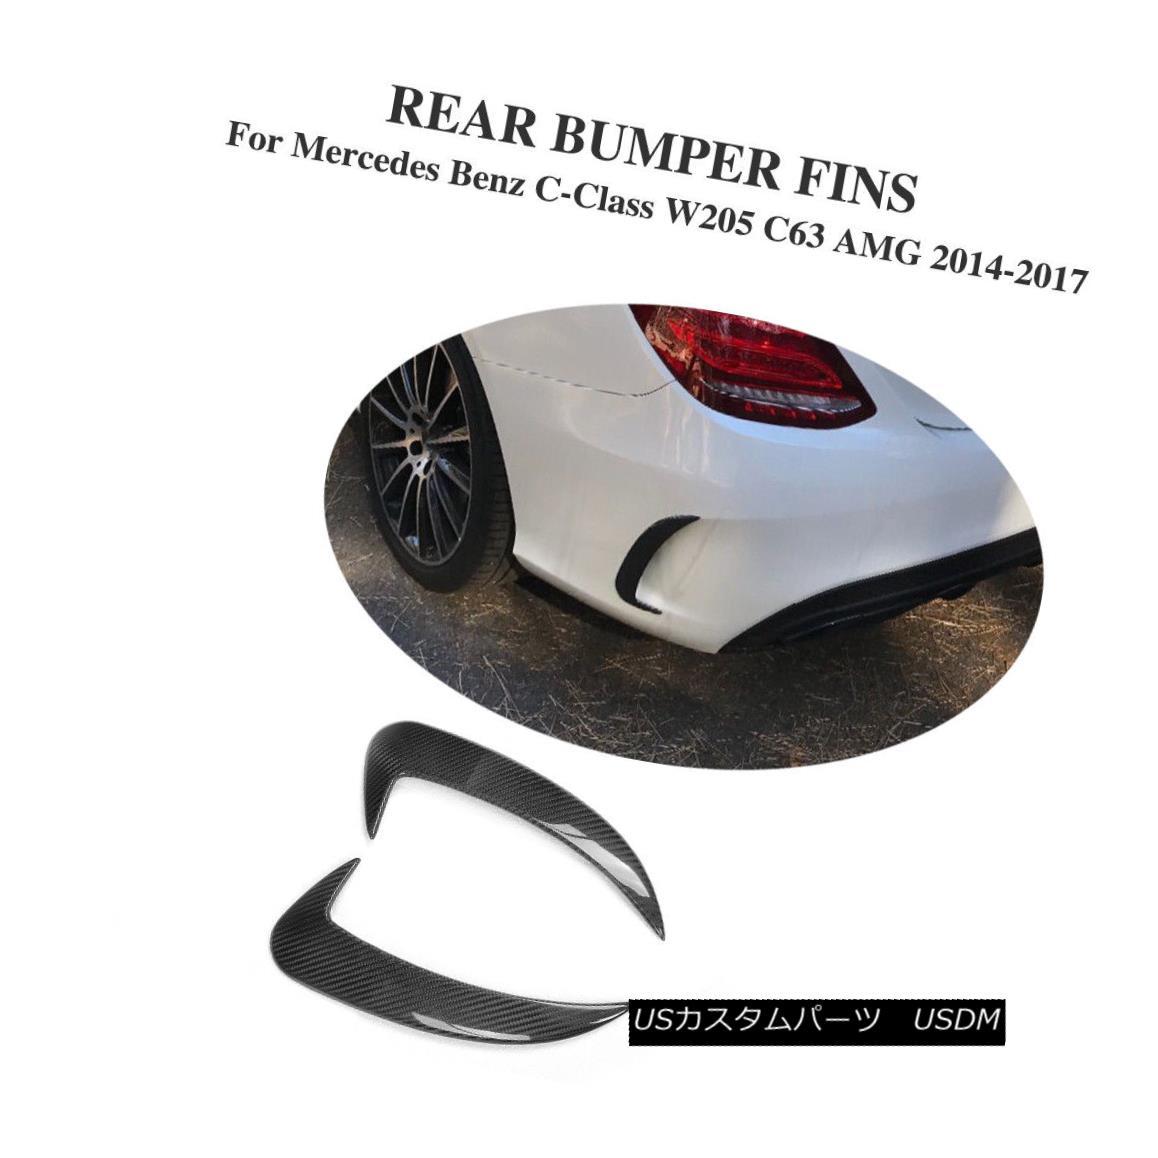 for 4D14-17 C200 Rear Vents Fit C63AMG エアロパーツ Benz W205 Carbon C63AMG Bumper Side 4D14-17のためのカーボンリアサイドバンパー通気孔のフィントリムフィット Fins ベンツW205 Trim C200